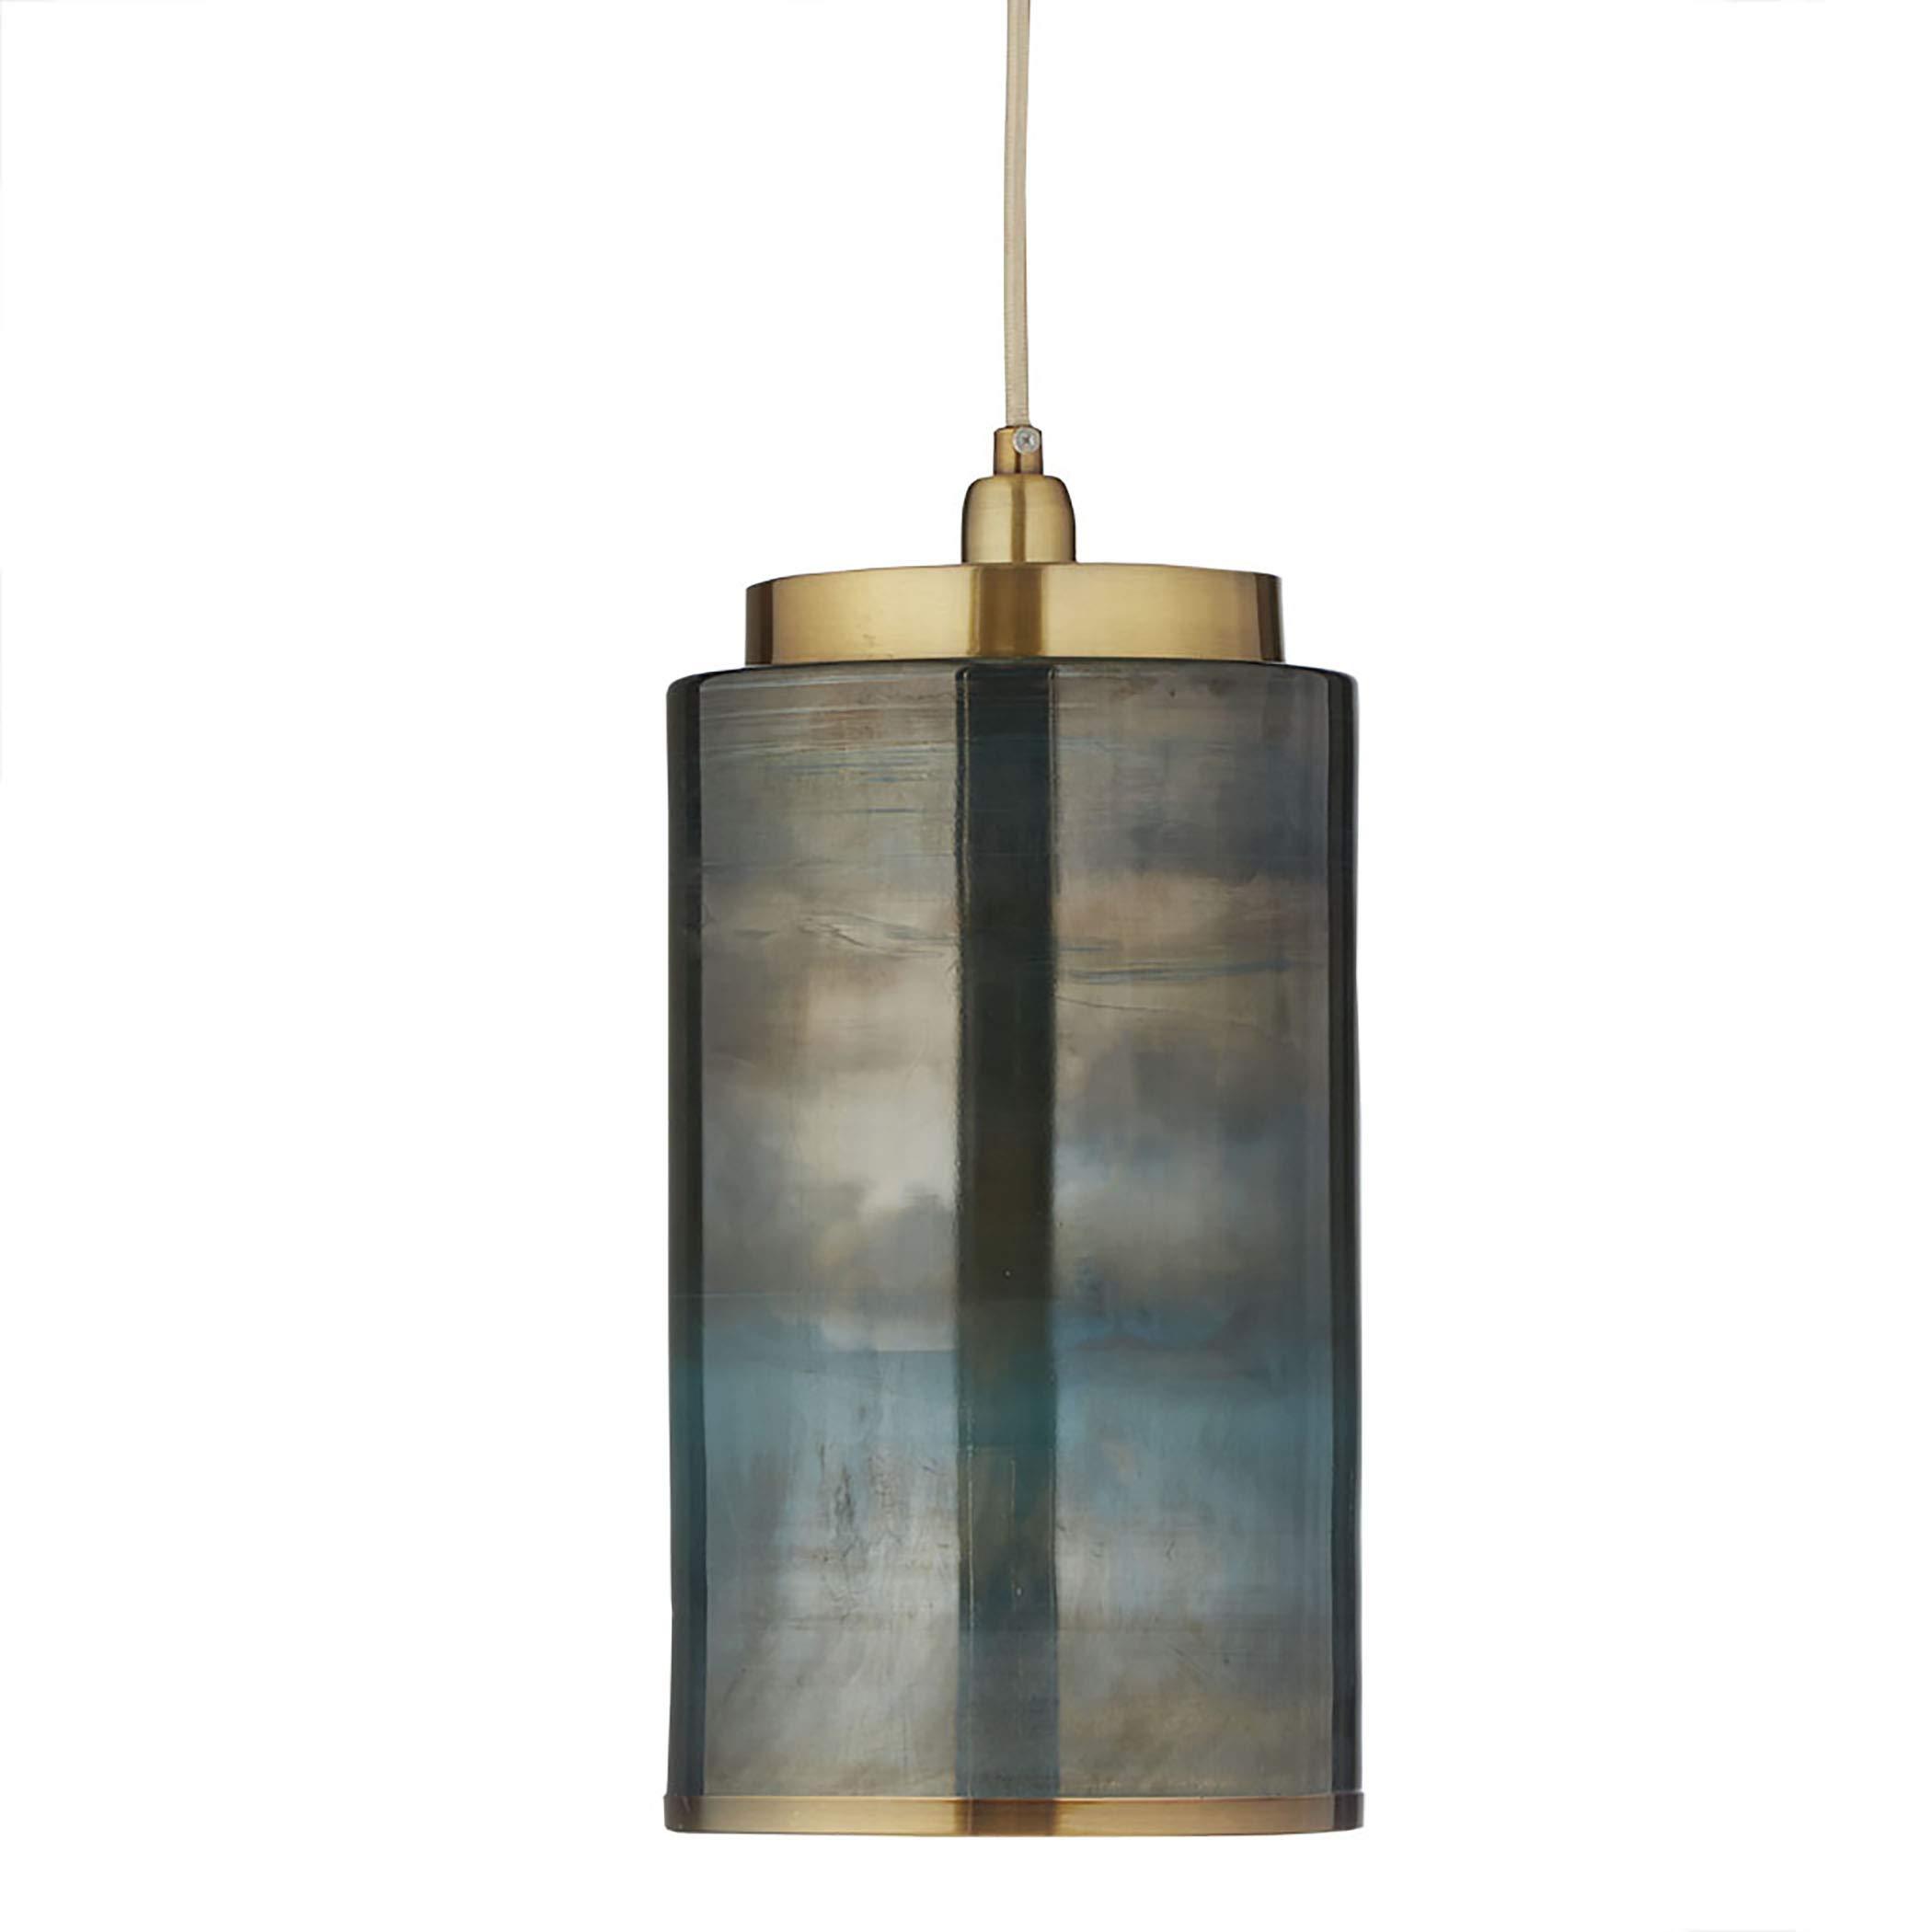 MADISON PARK 标志性 天花板餐厅照明灯具 悬挂 蓝色 See below MPS151-0062